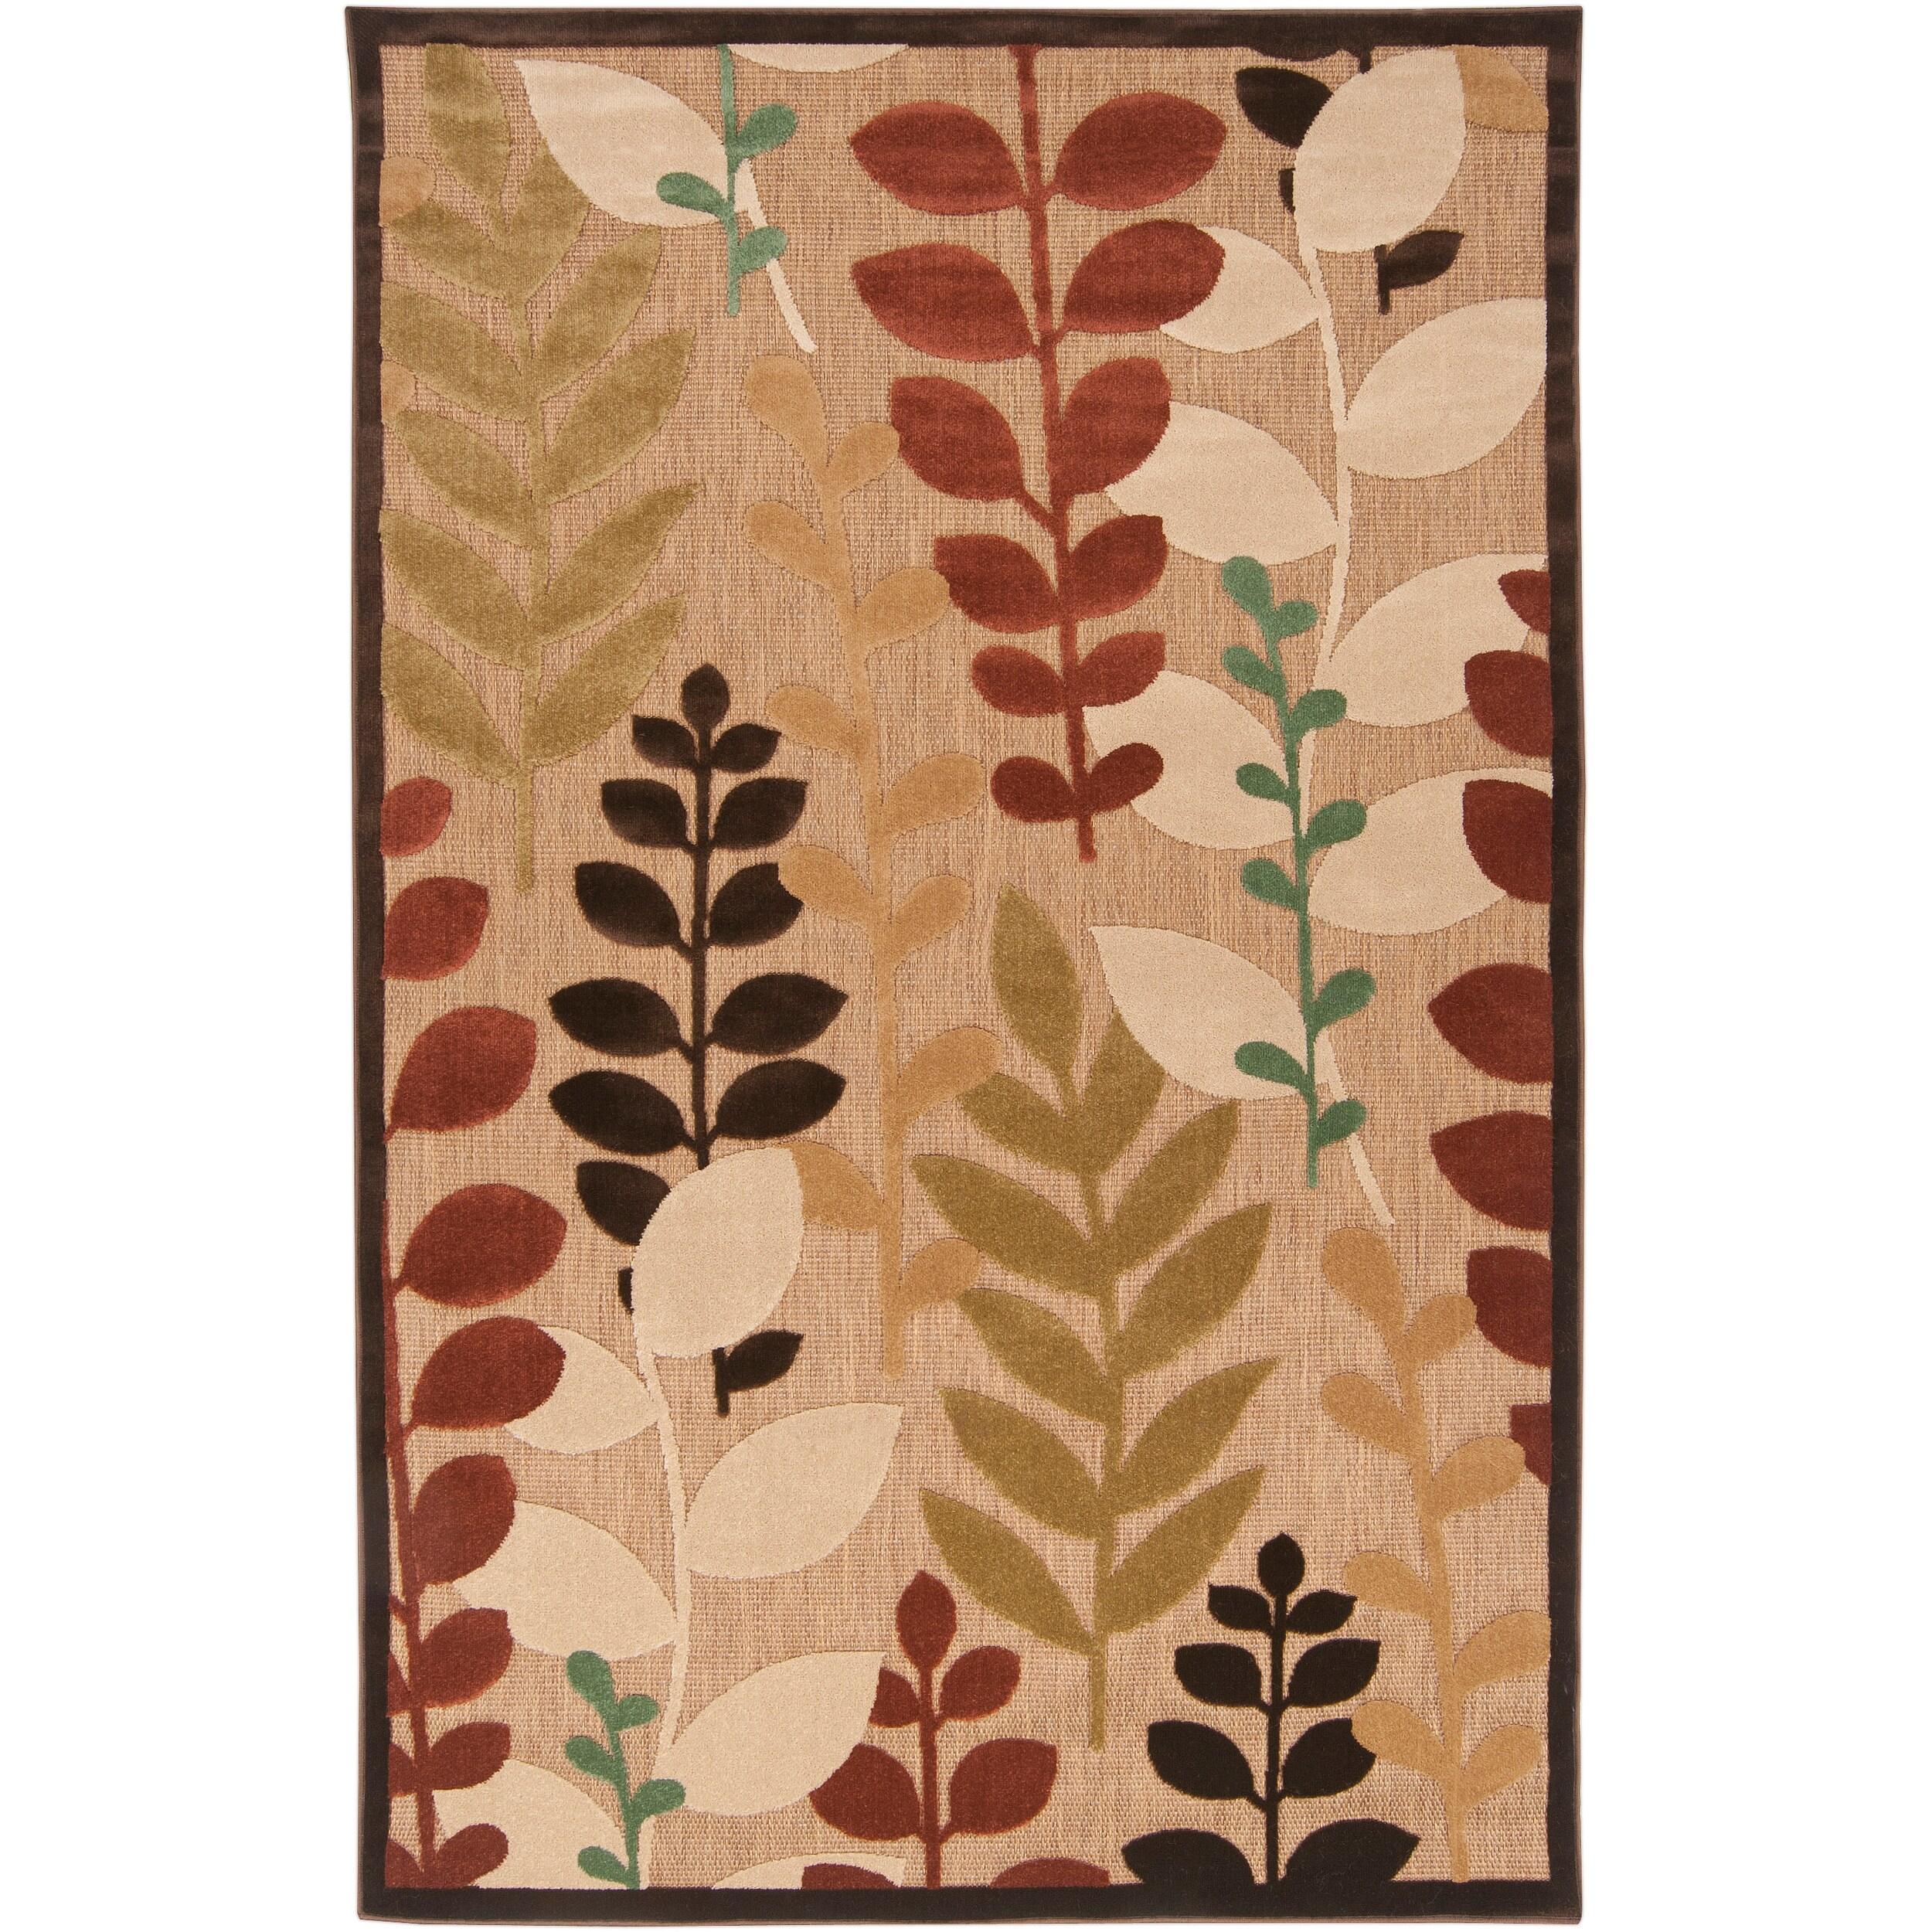 Pine Canopy Sierra Woven Beige Floral Area Rug - 7'10 x 10'8'